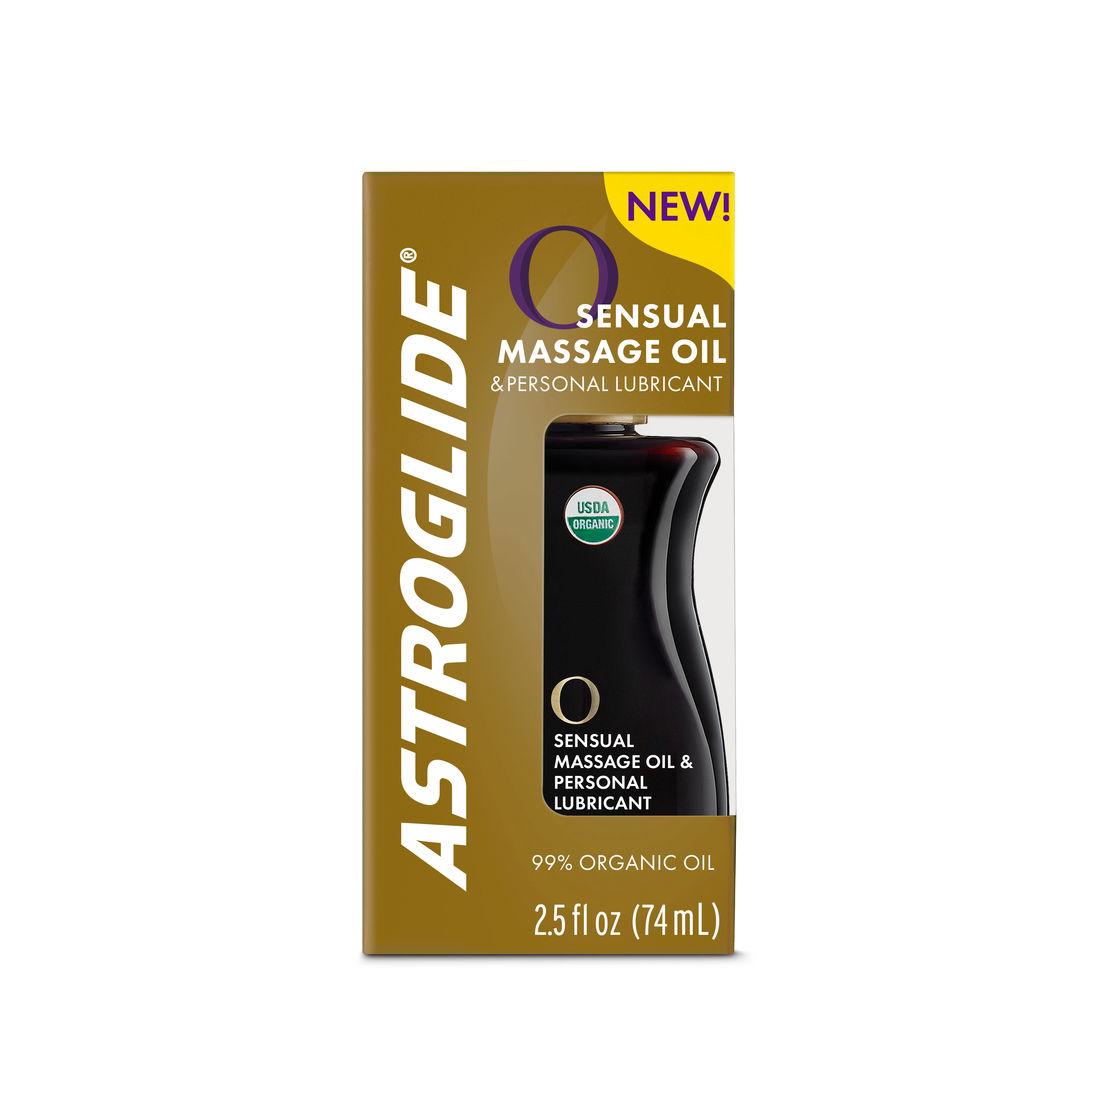 Astroglide Organic Oil Personal Lubricant 74ml